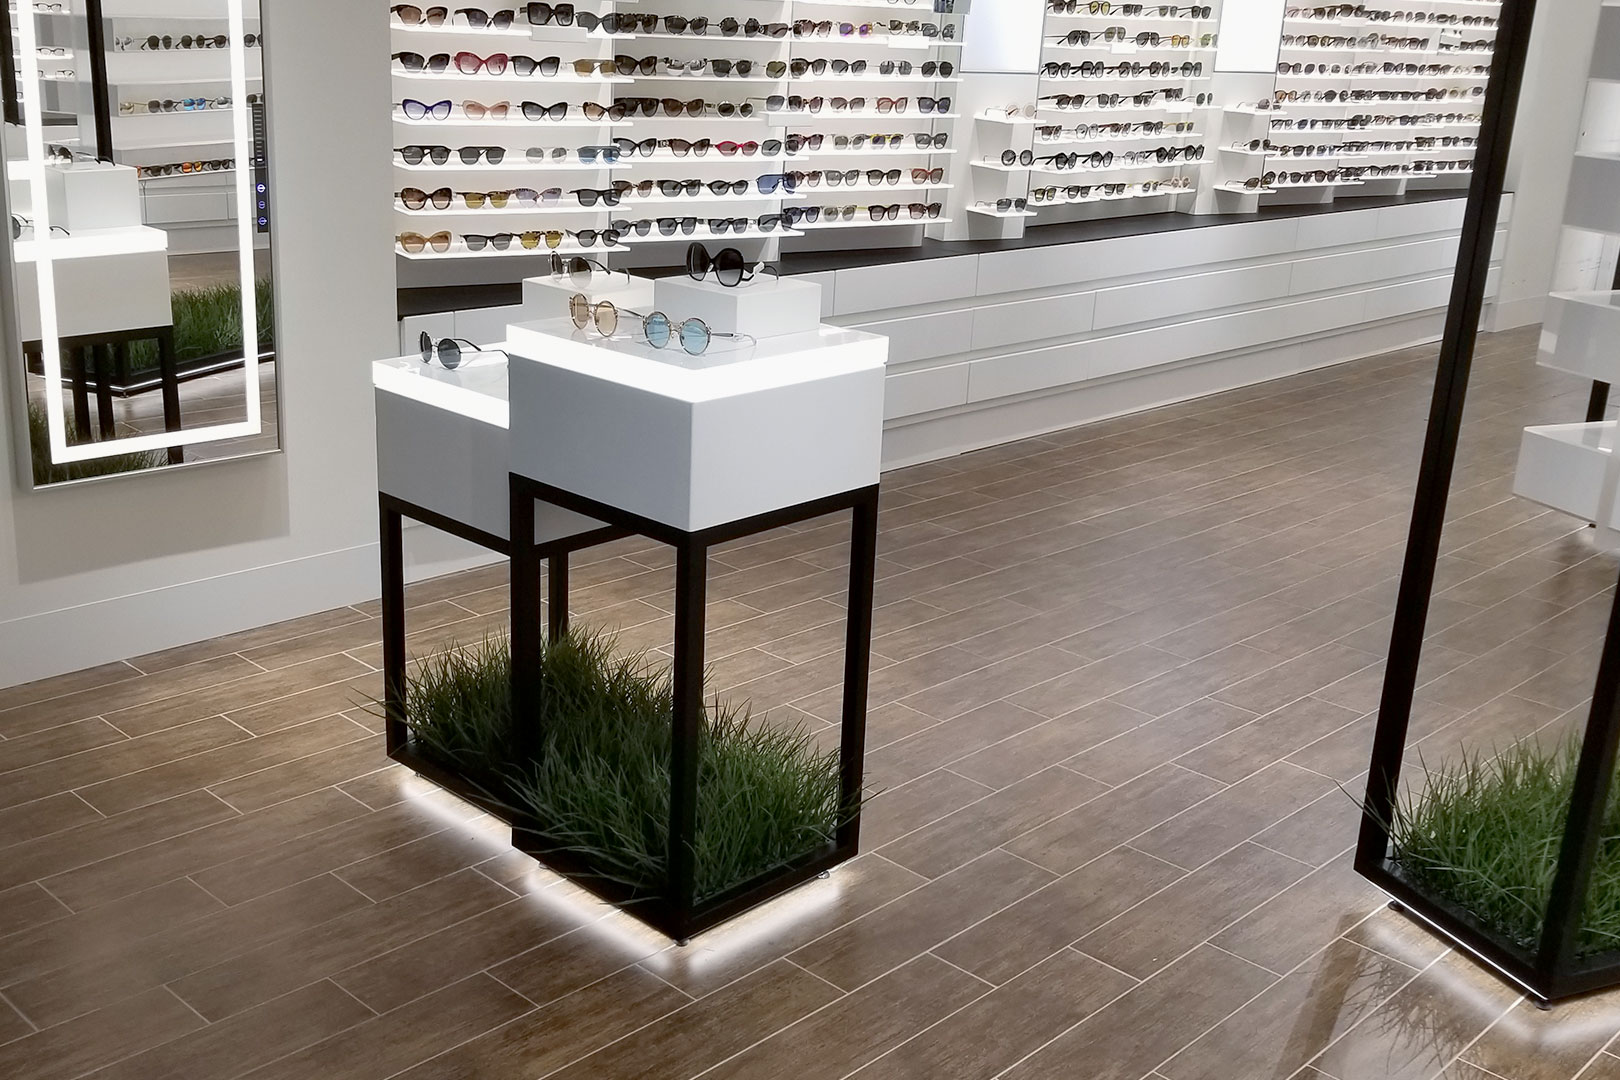 5th and Sunset Luxury Eyewaer Free Standing Displays